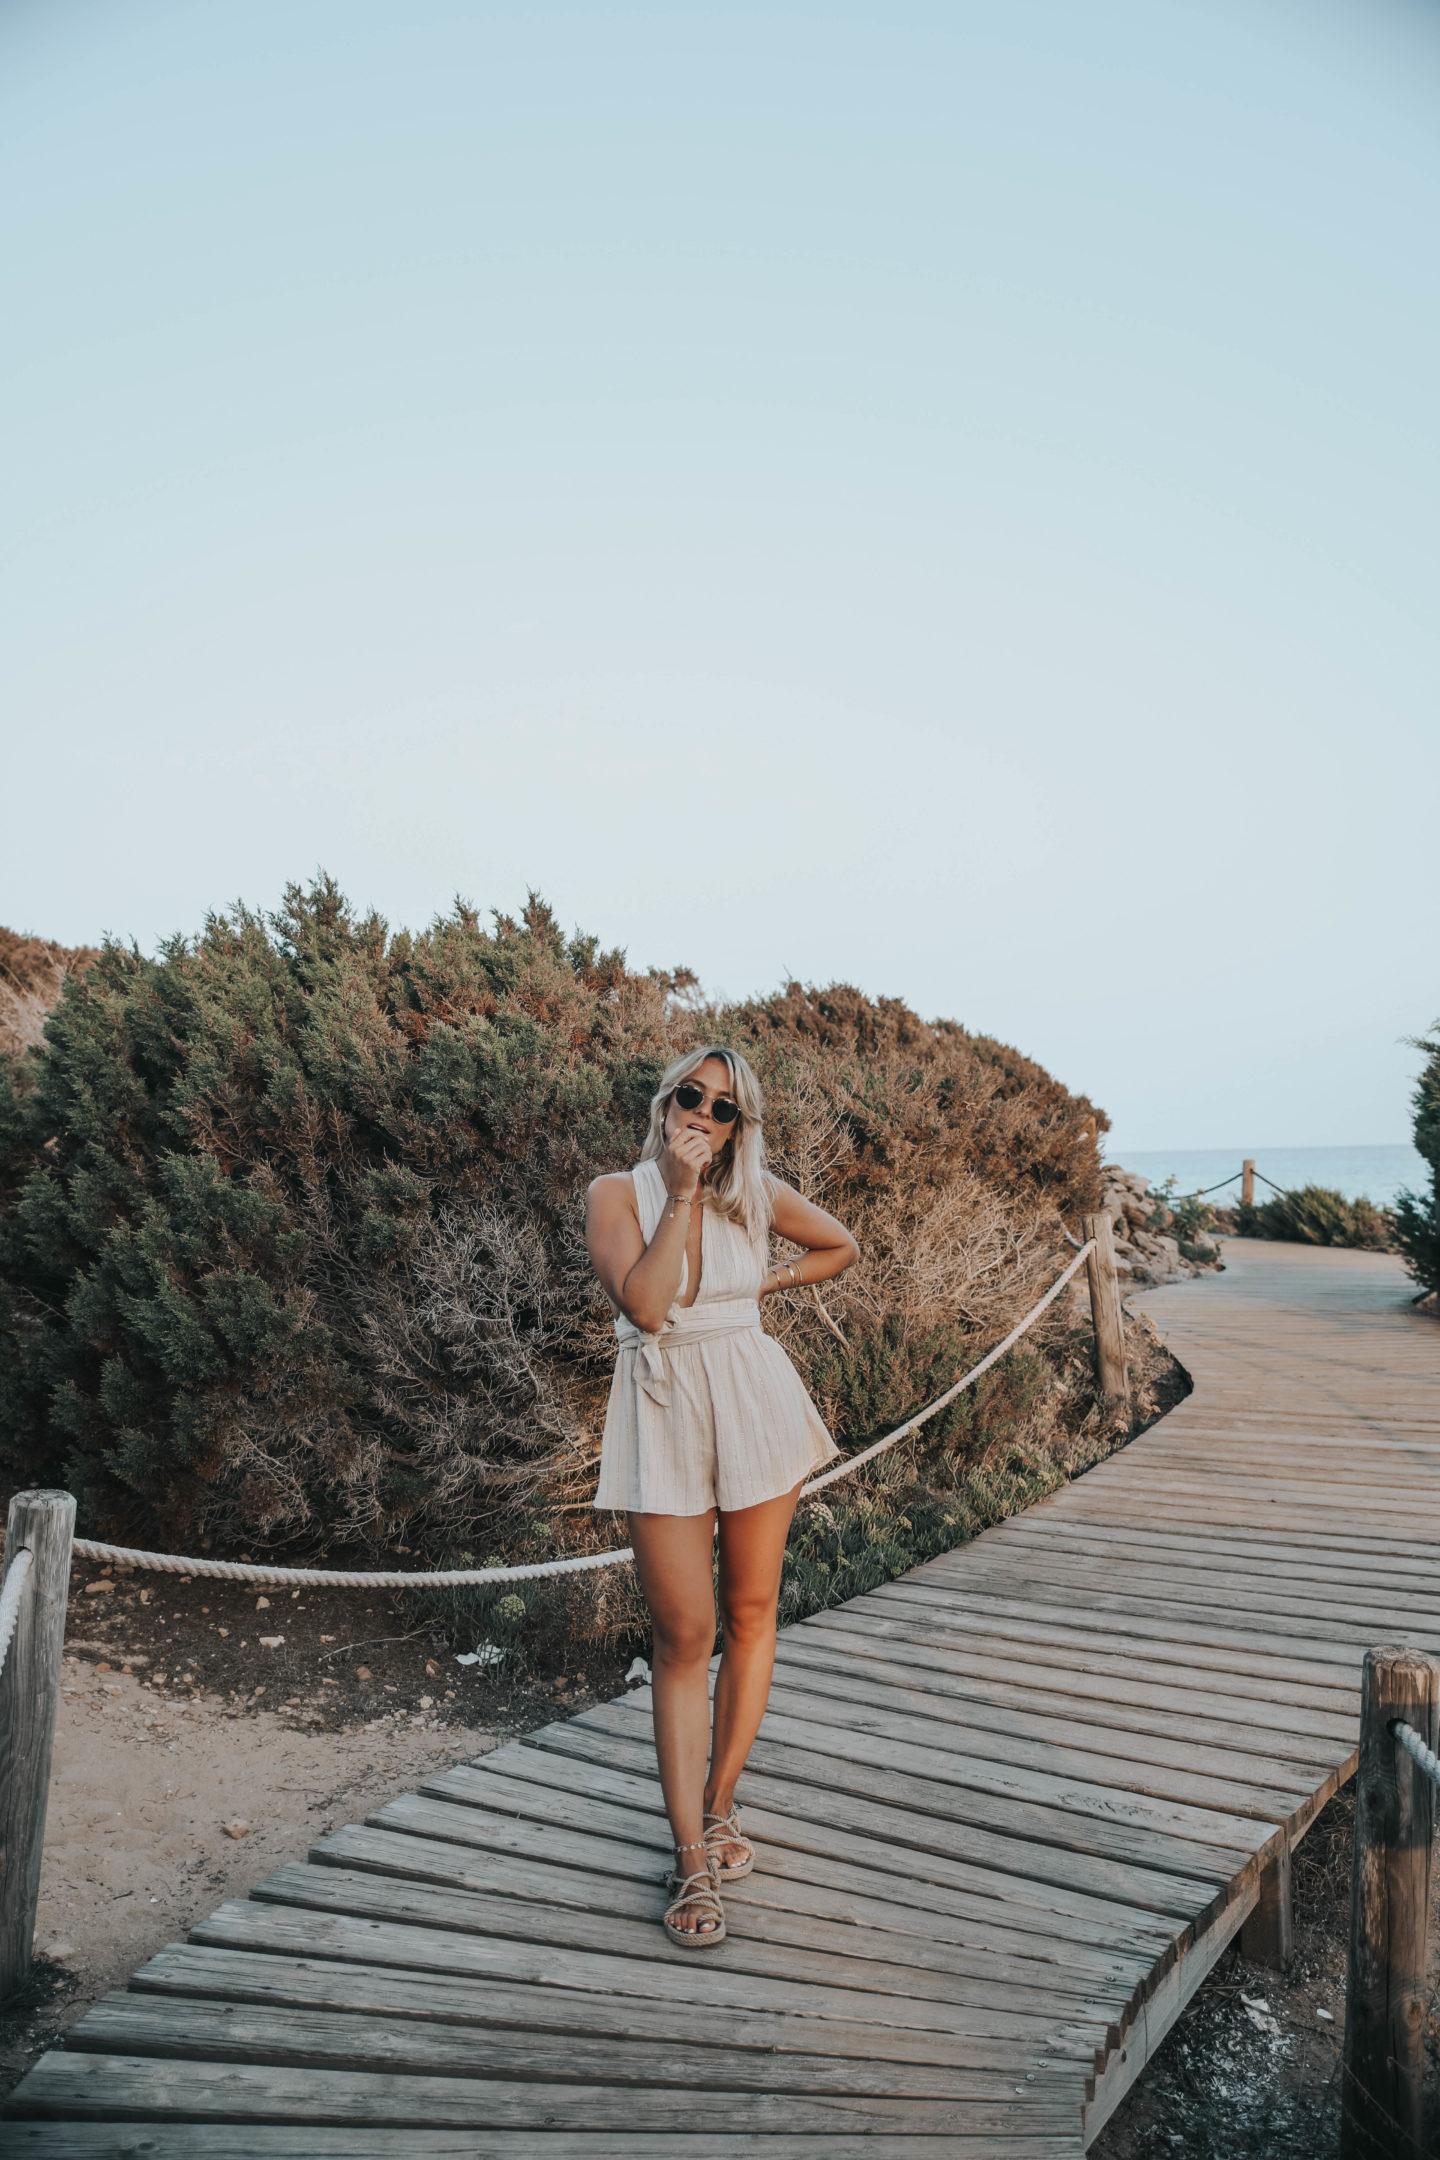 Visiter Formentera - Blondie Baby blog mode Paris et voyages